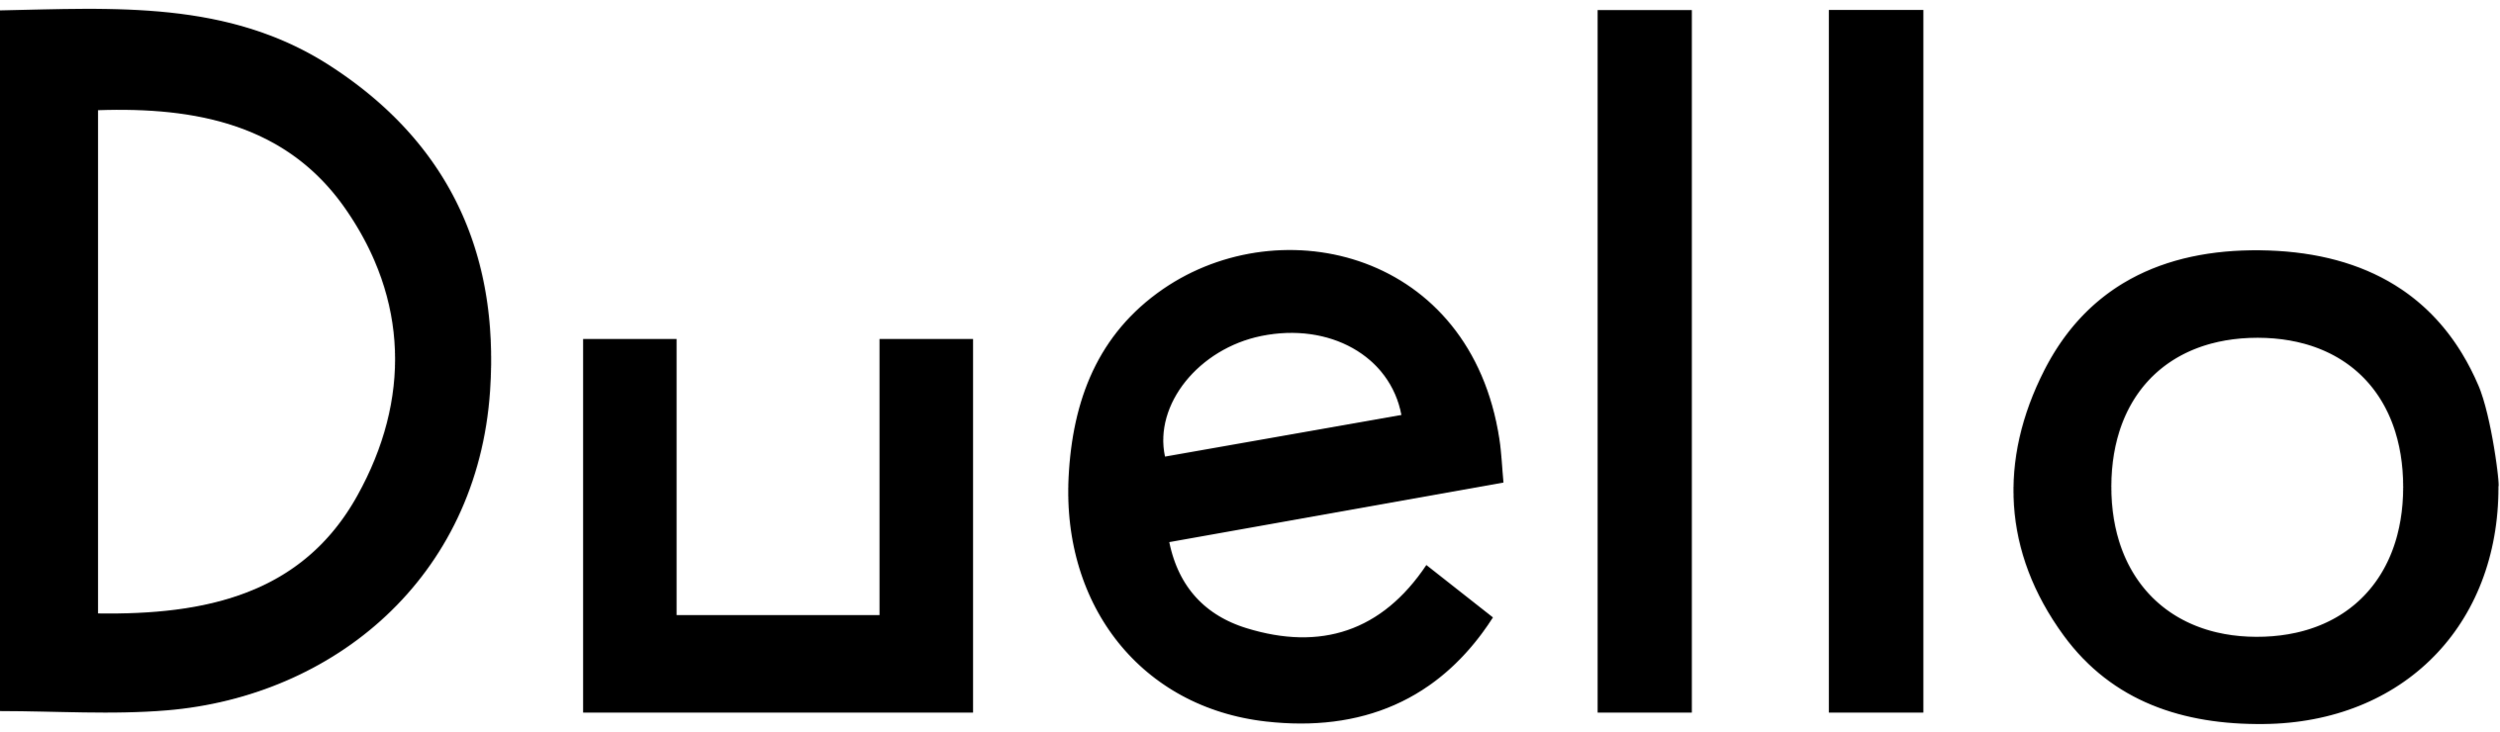 Duello-Logo-1-WEB.png